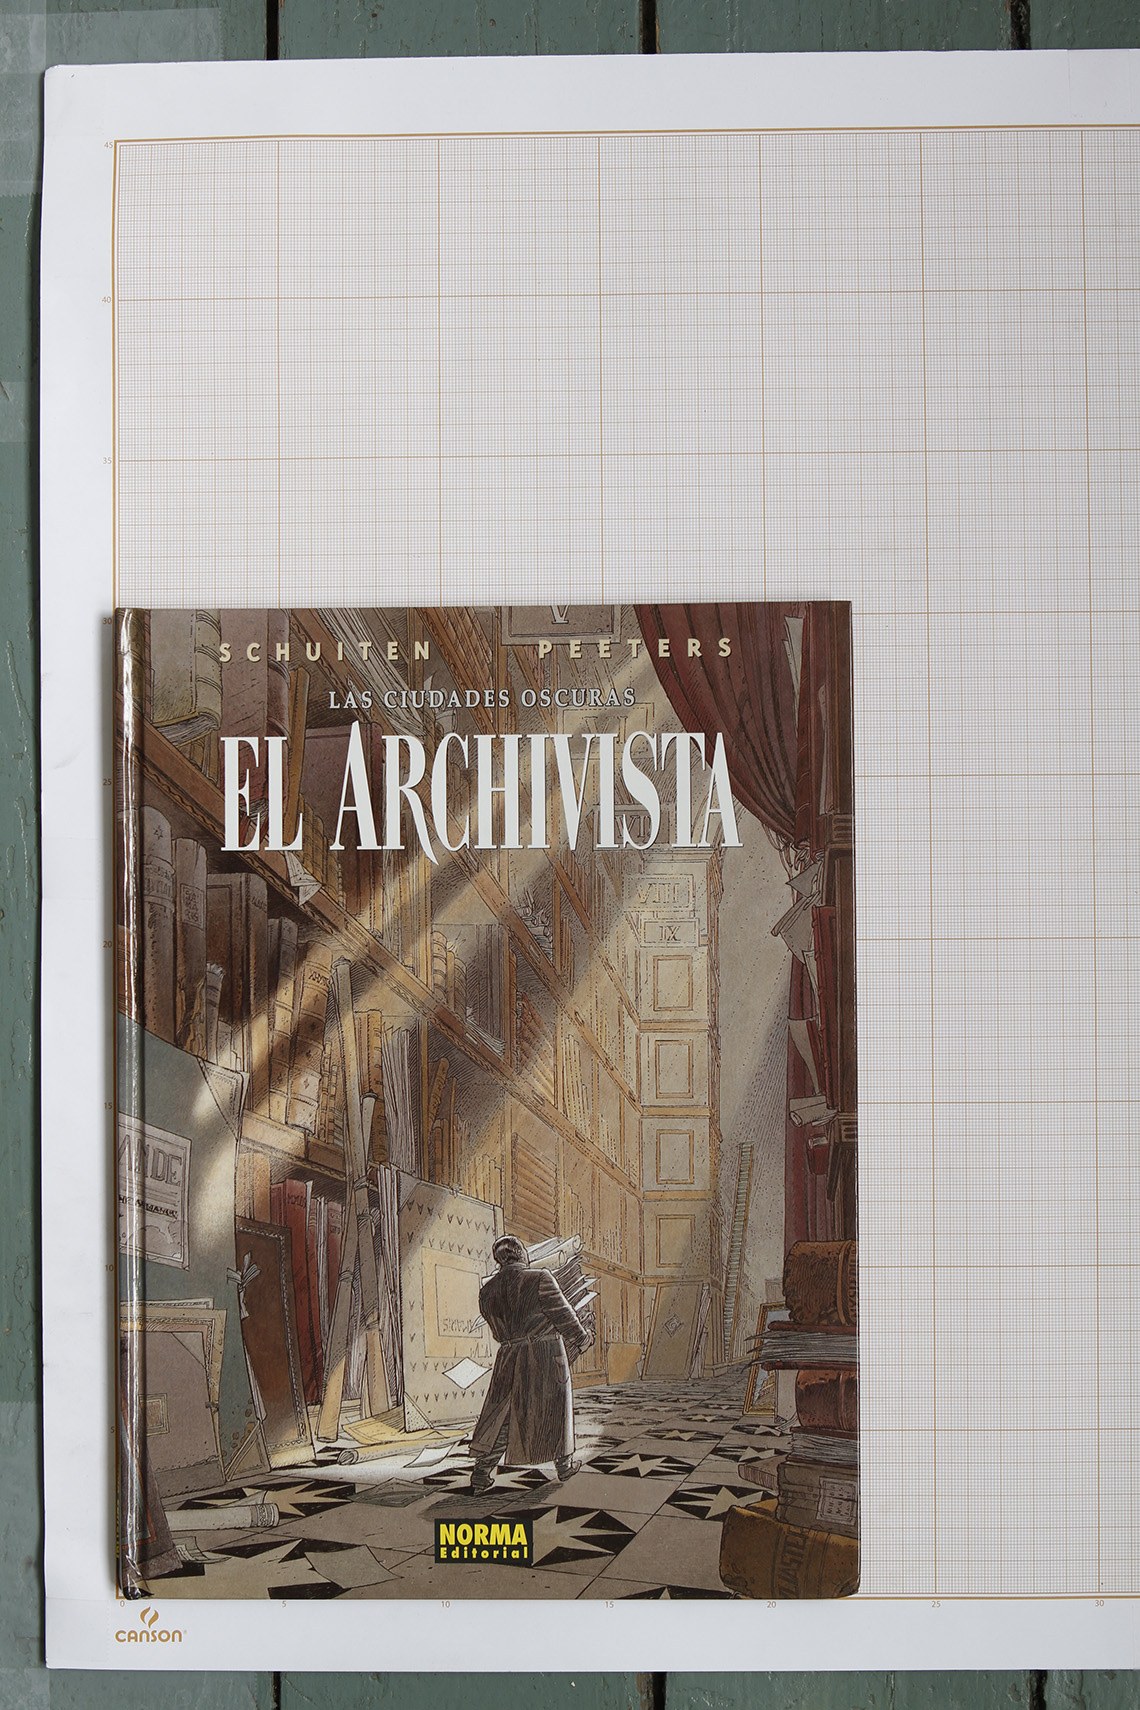 El Archivista, F.Schuiten & B.Peeters - Norma Editorial© Maison Autrique, 2001